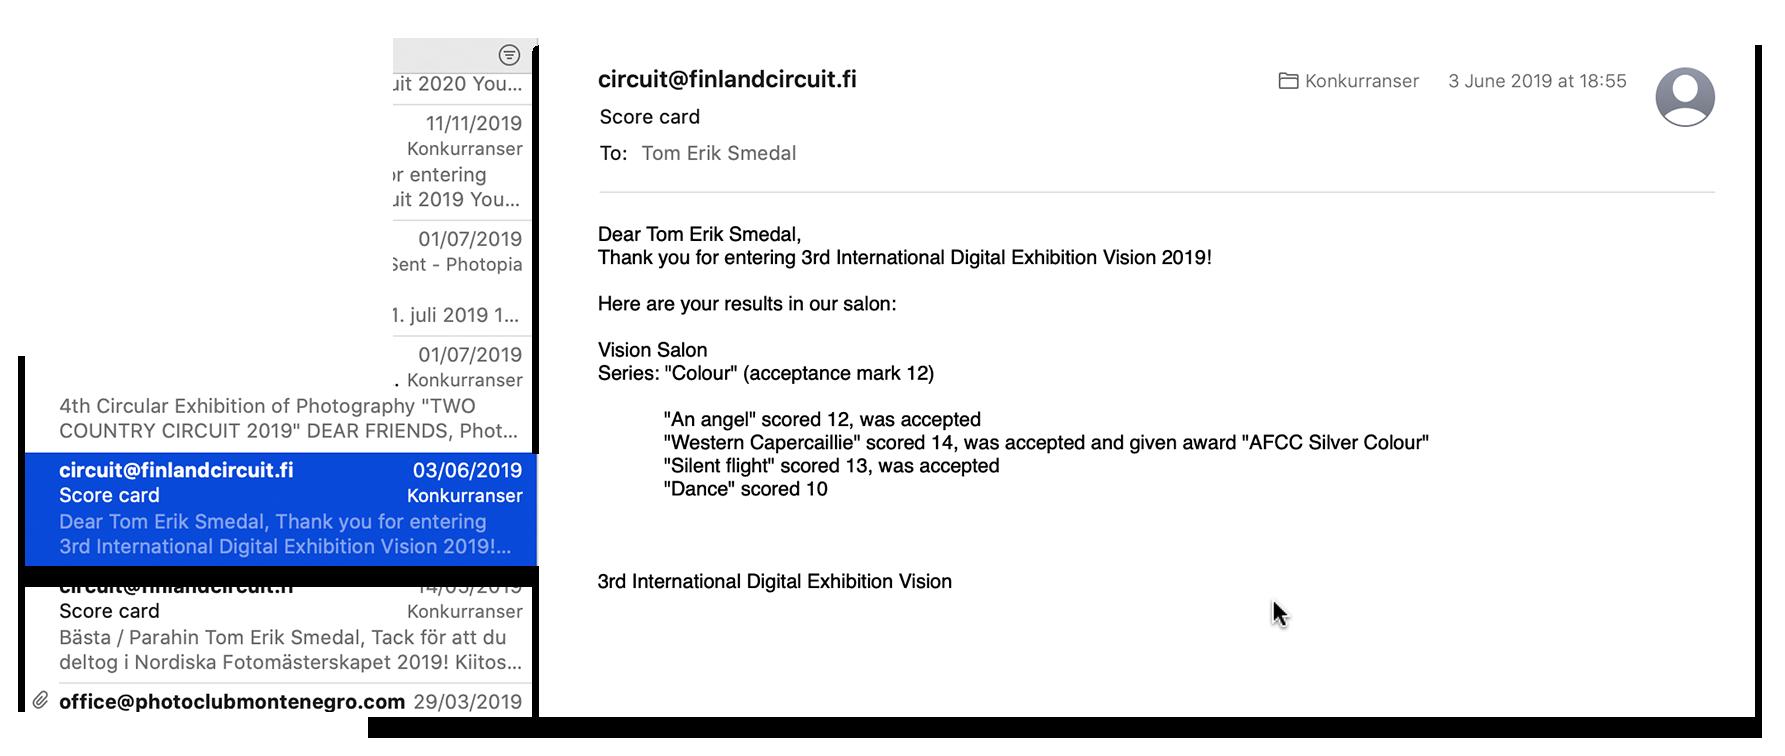 Tom Erik Smedal: Score card